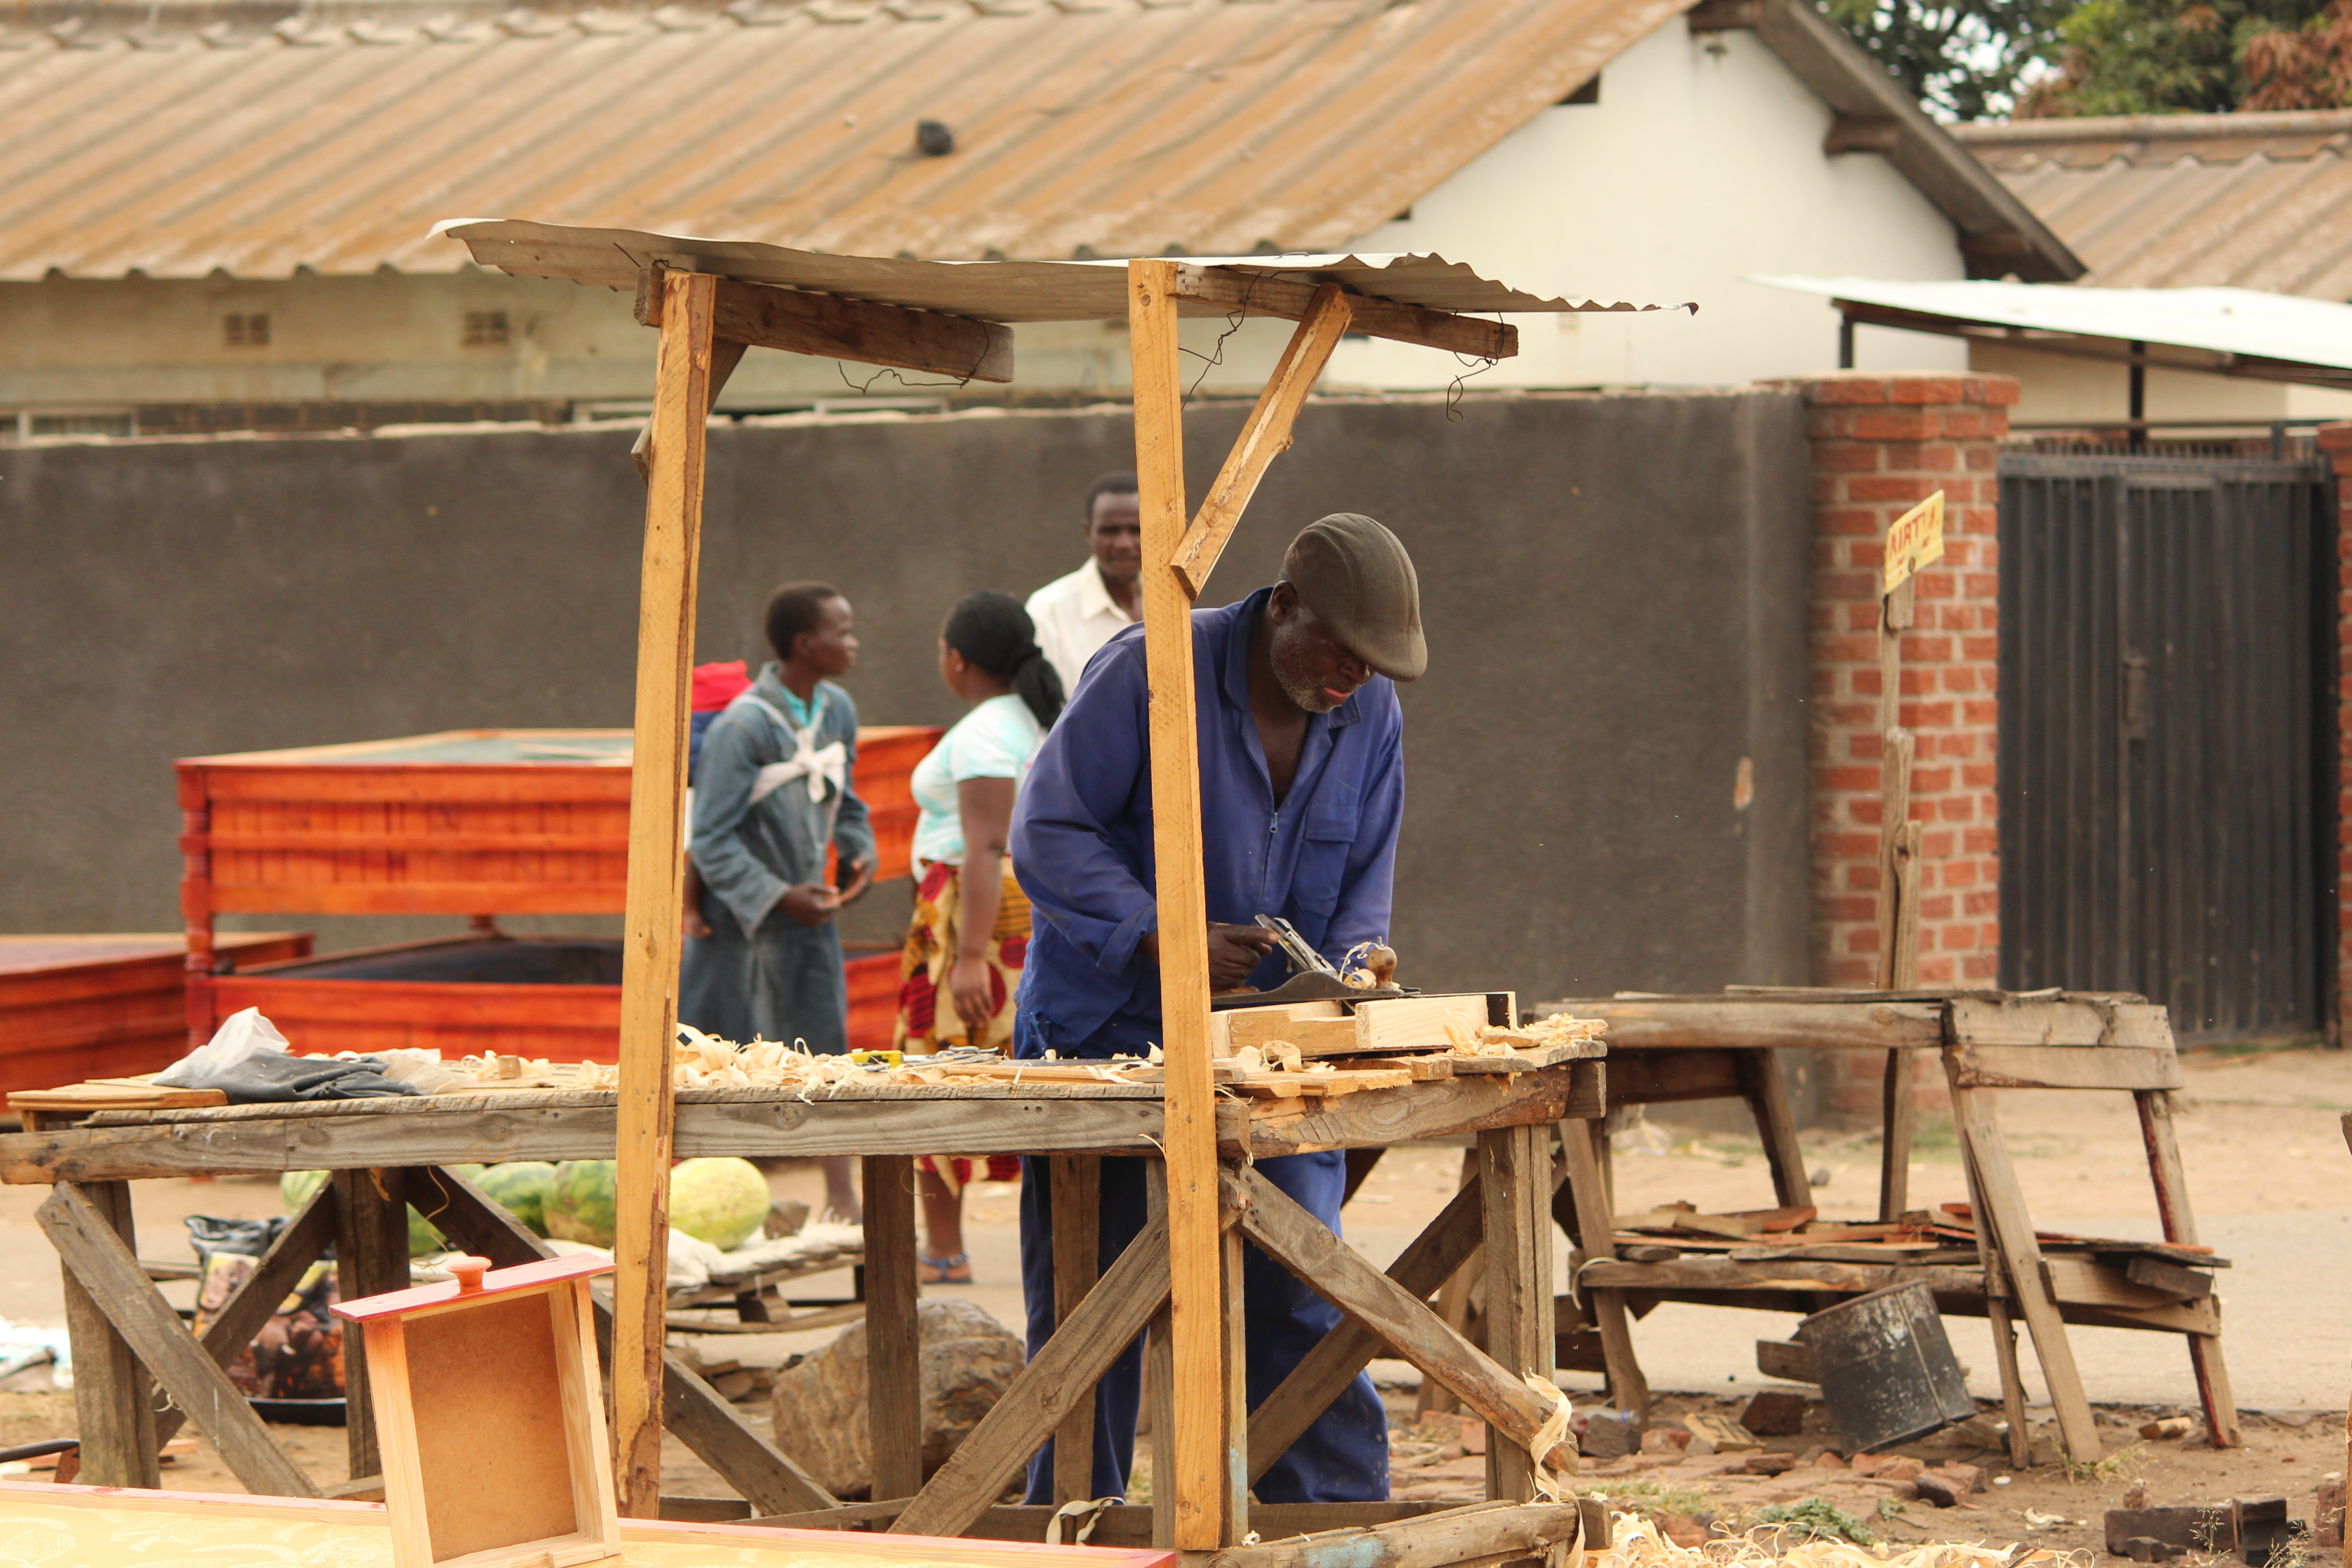 Informal Carpentry Hammers Away Zimbabwe's State Revenue